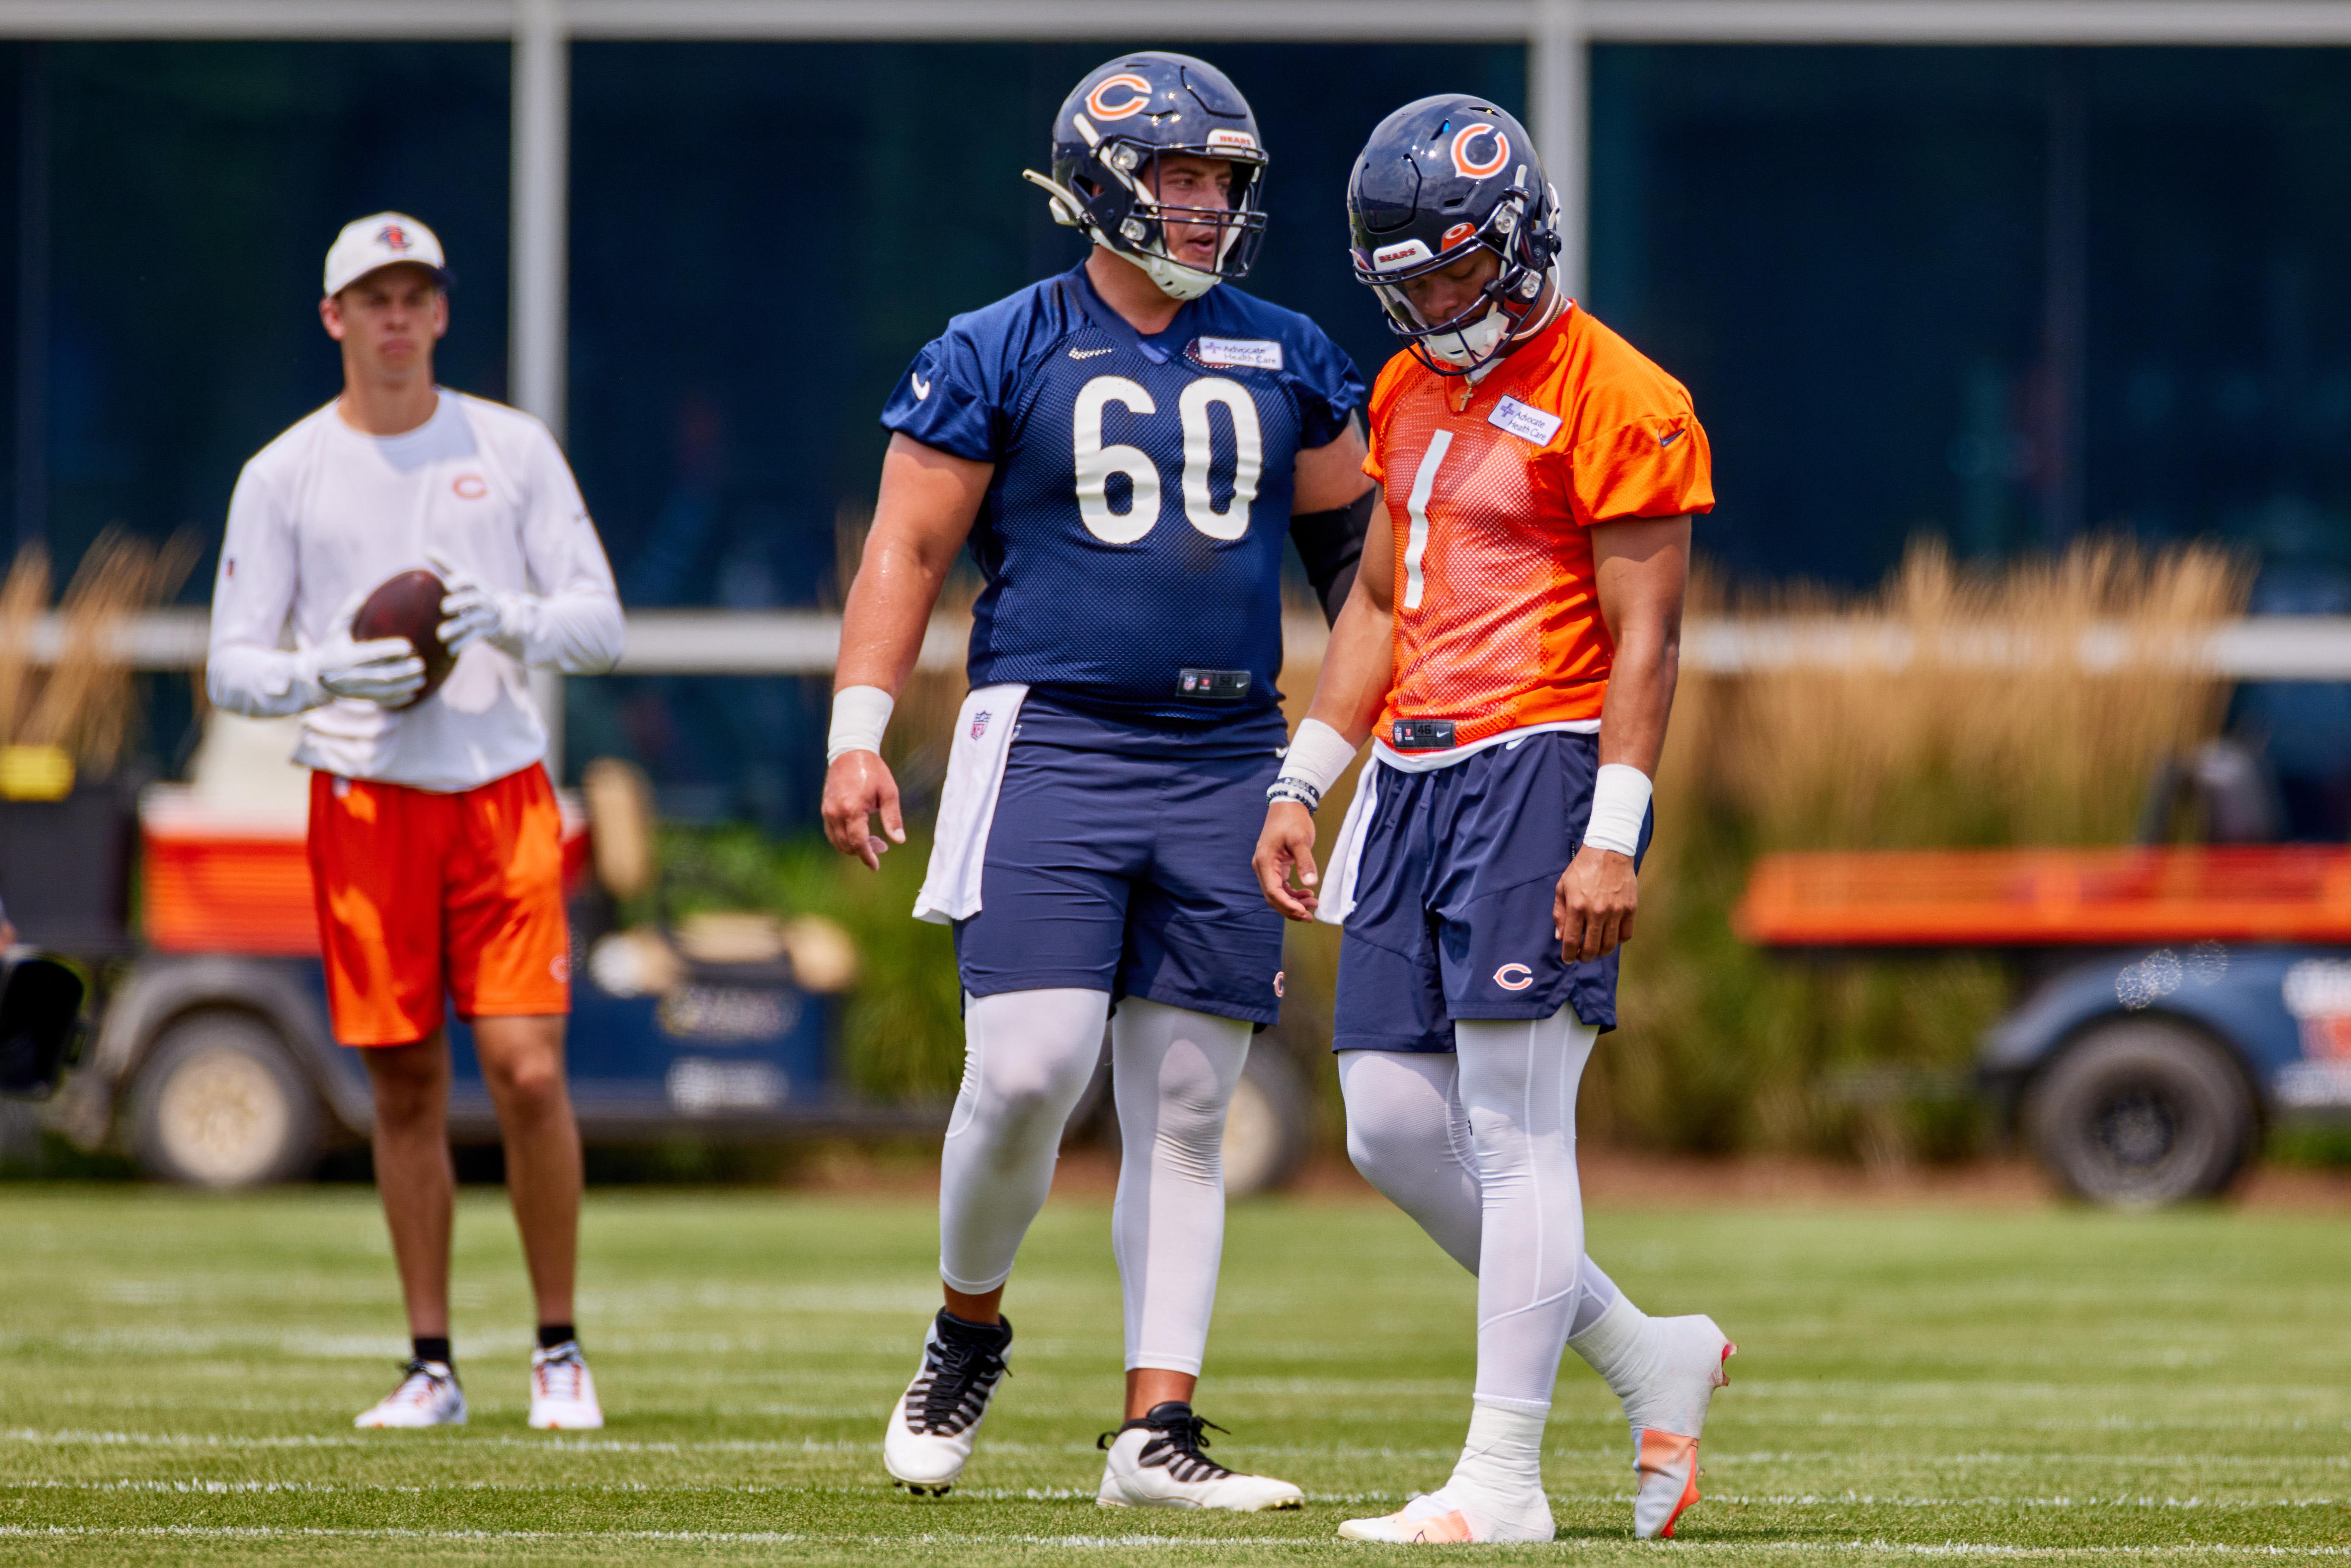 NFL: JUL 28 Chicago Bears Training Camp